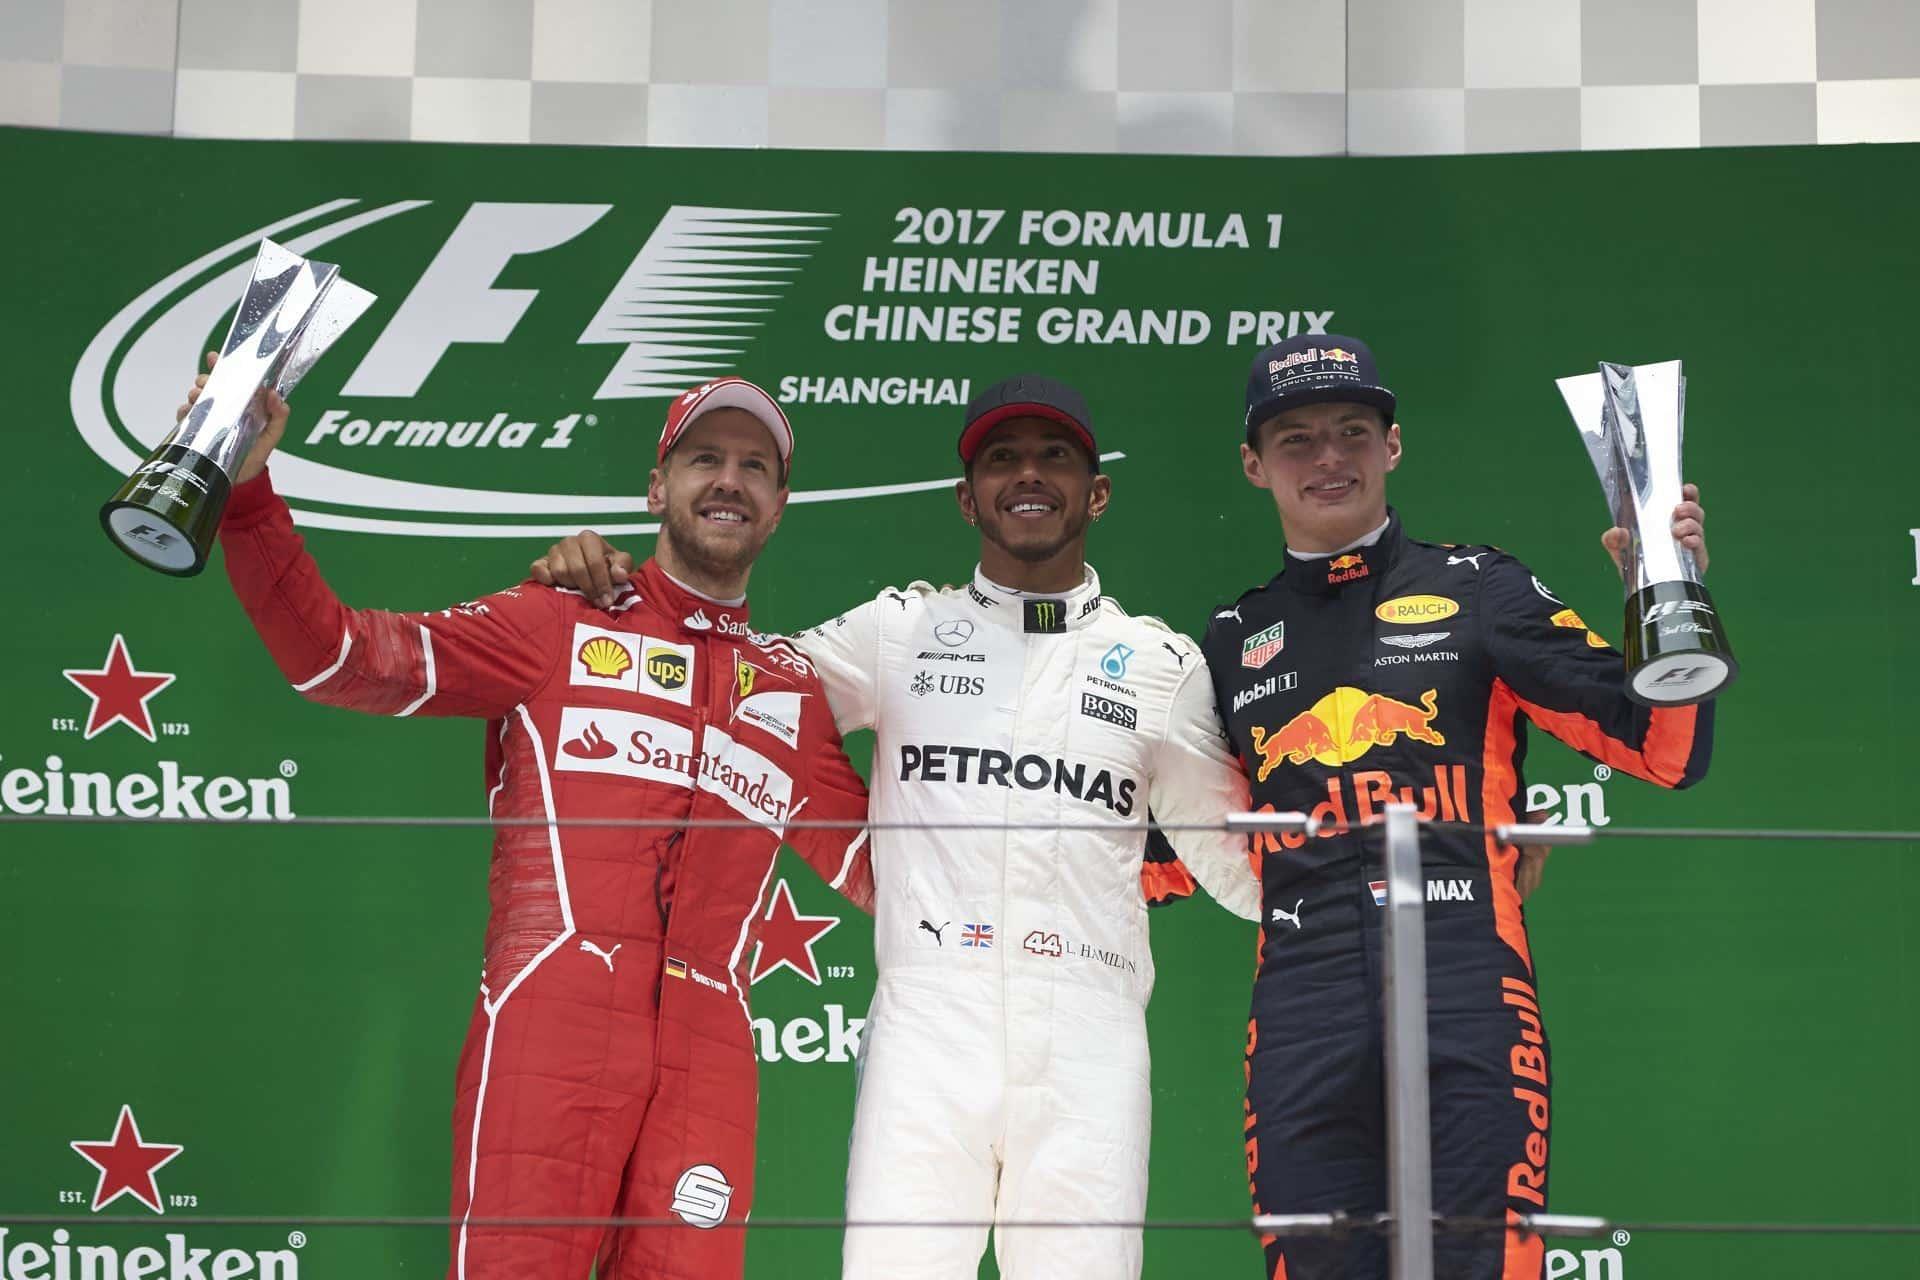 Chinese GP F1 2017 podium Foto Daimler